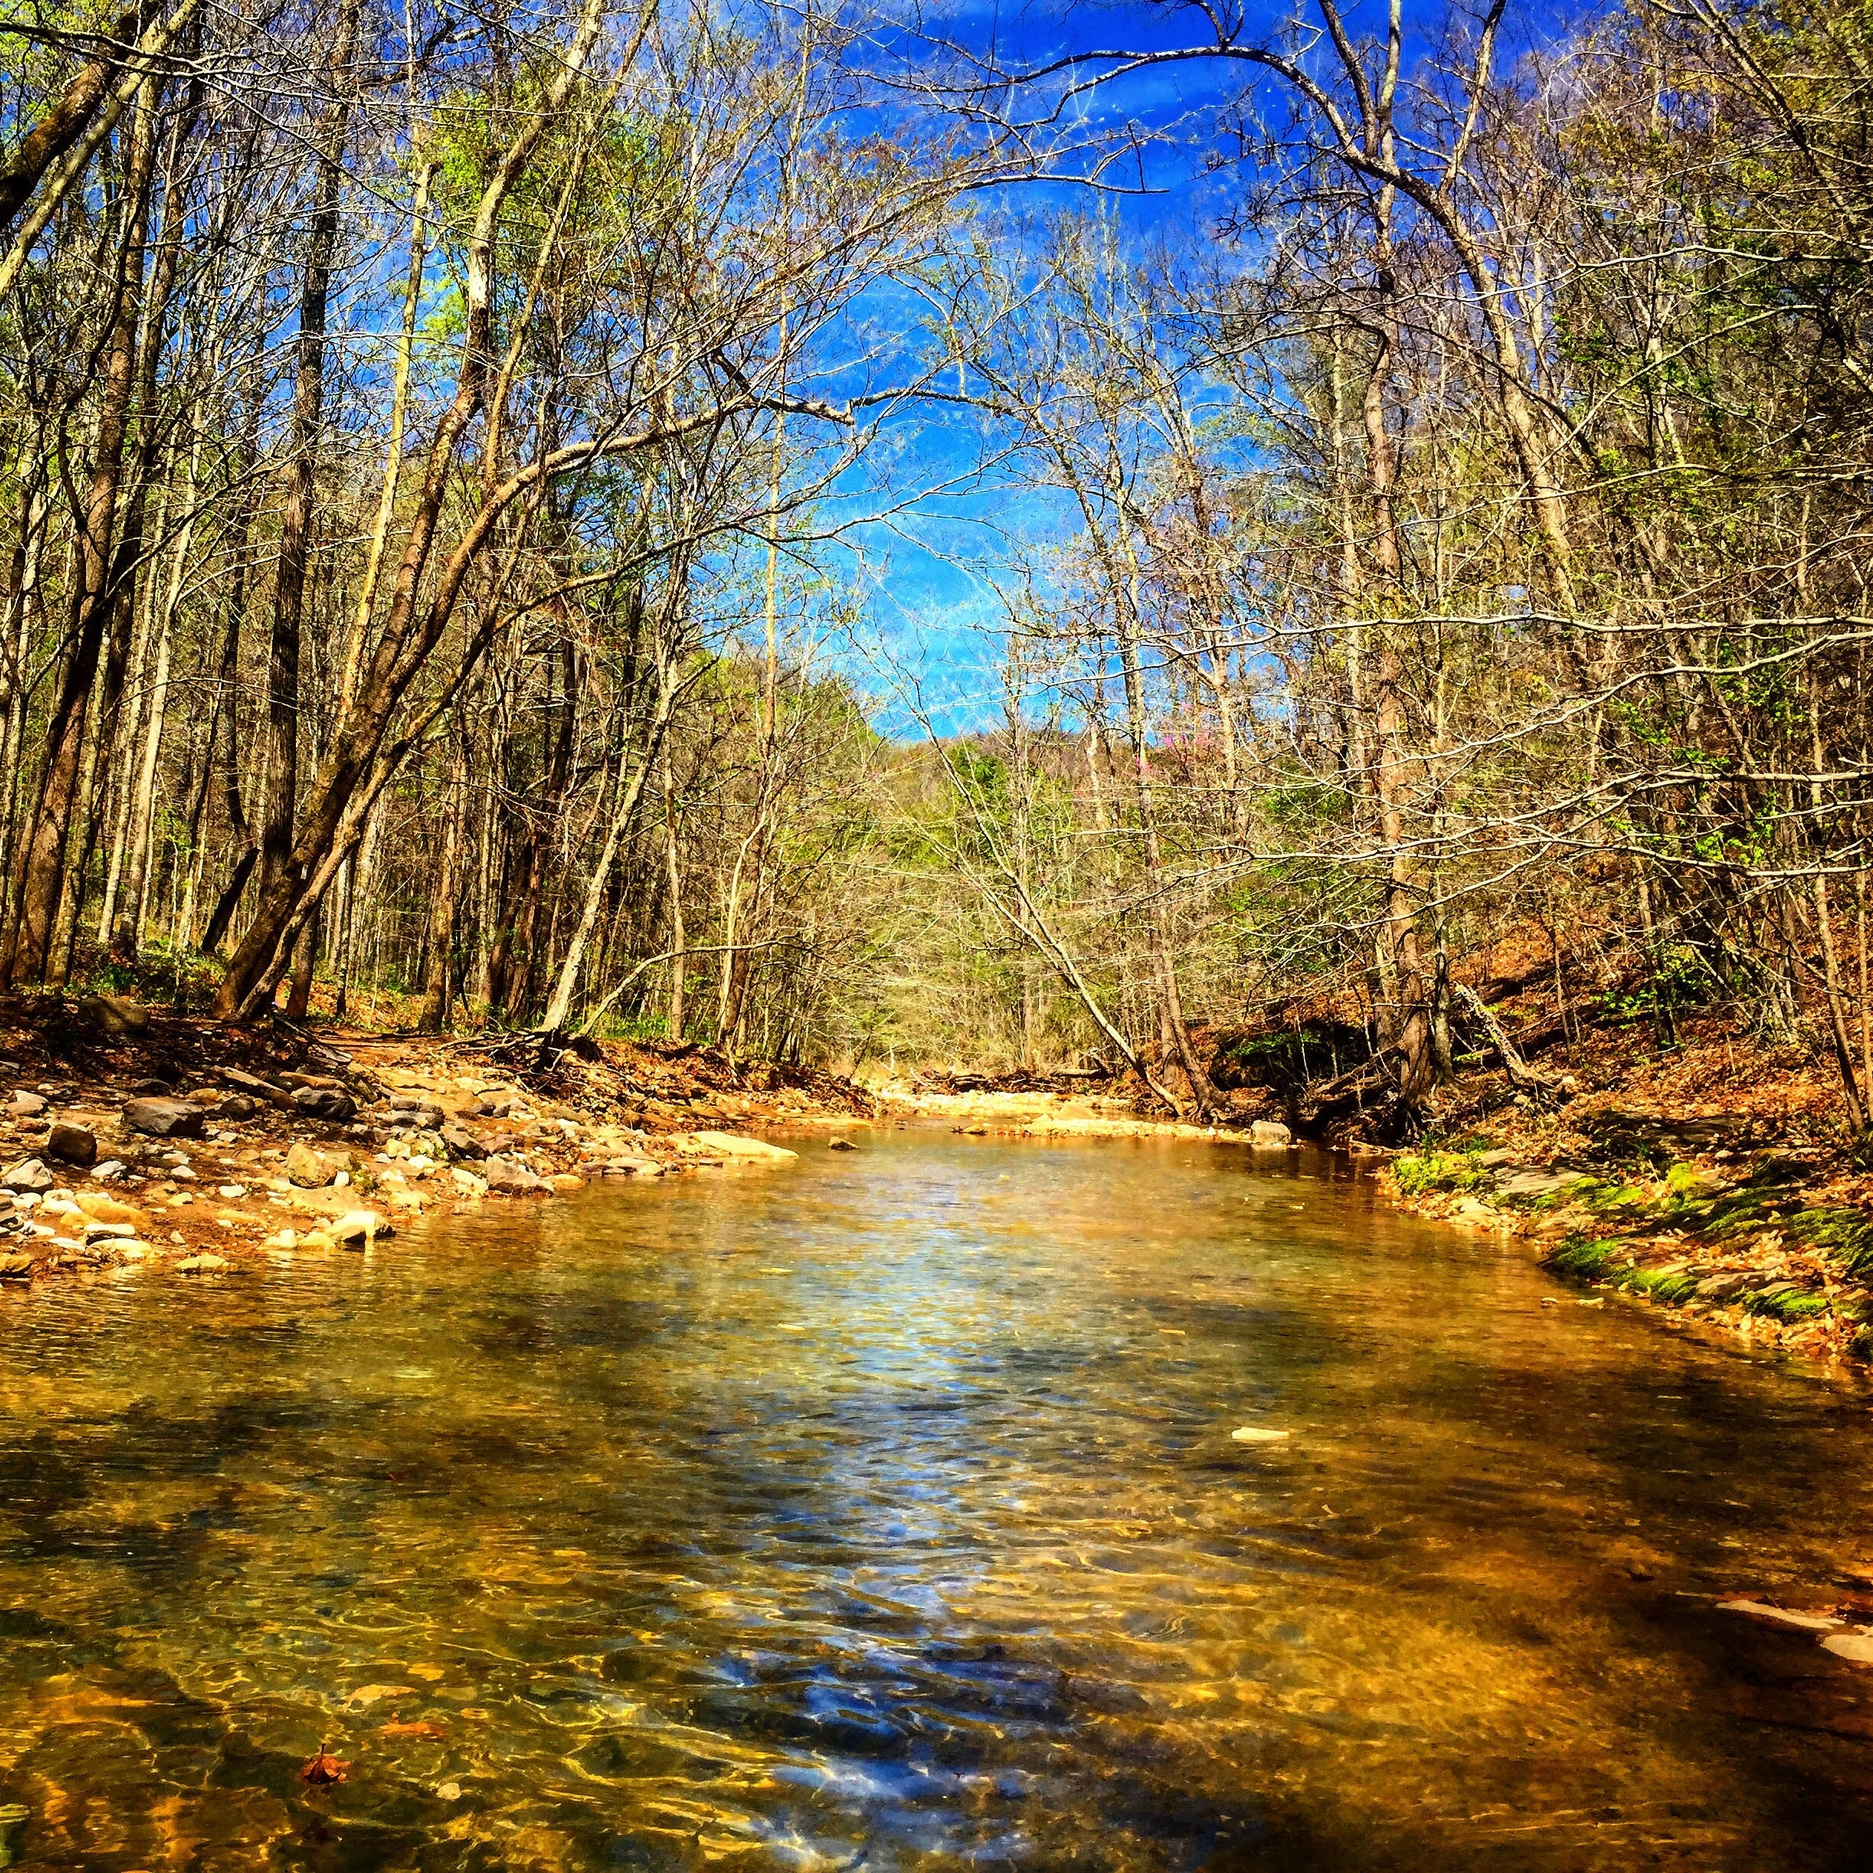 The Buffalo River's gentle sounds keep travelers company.